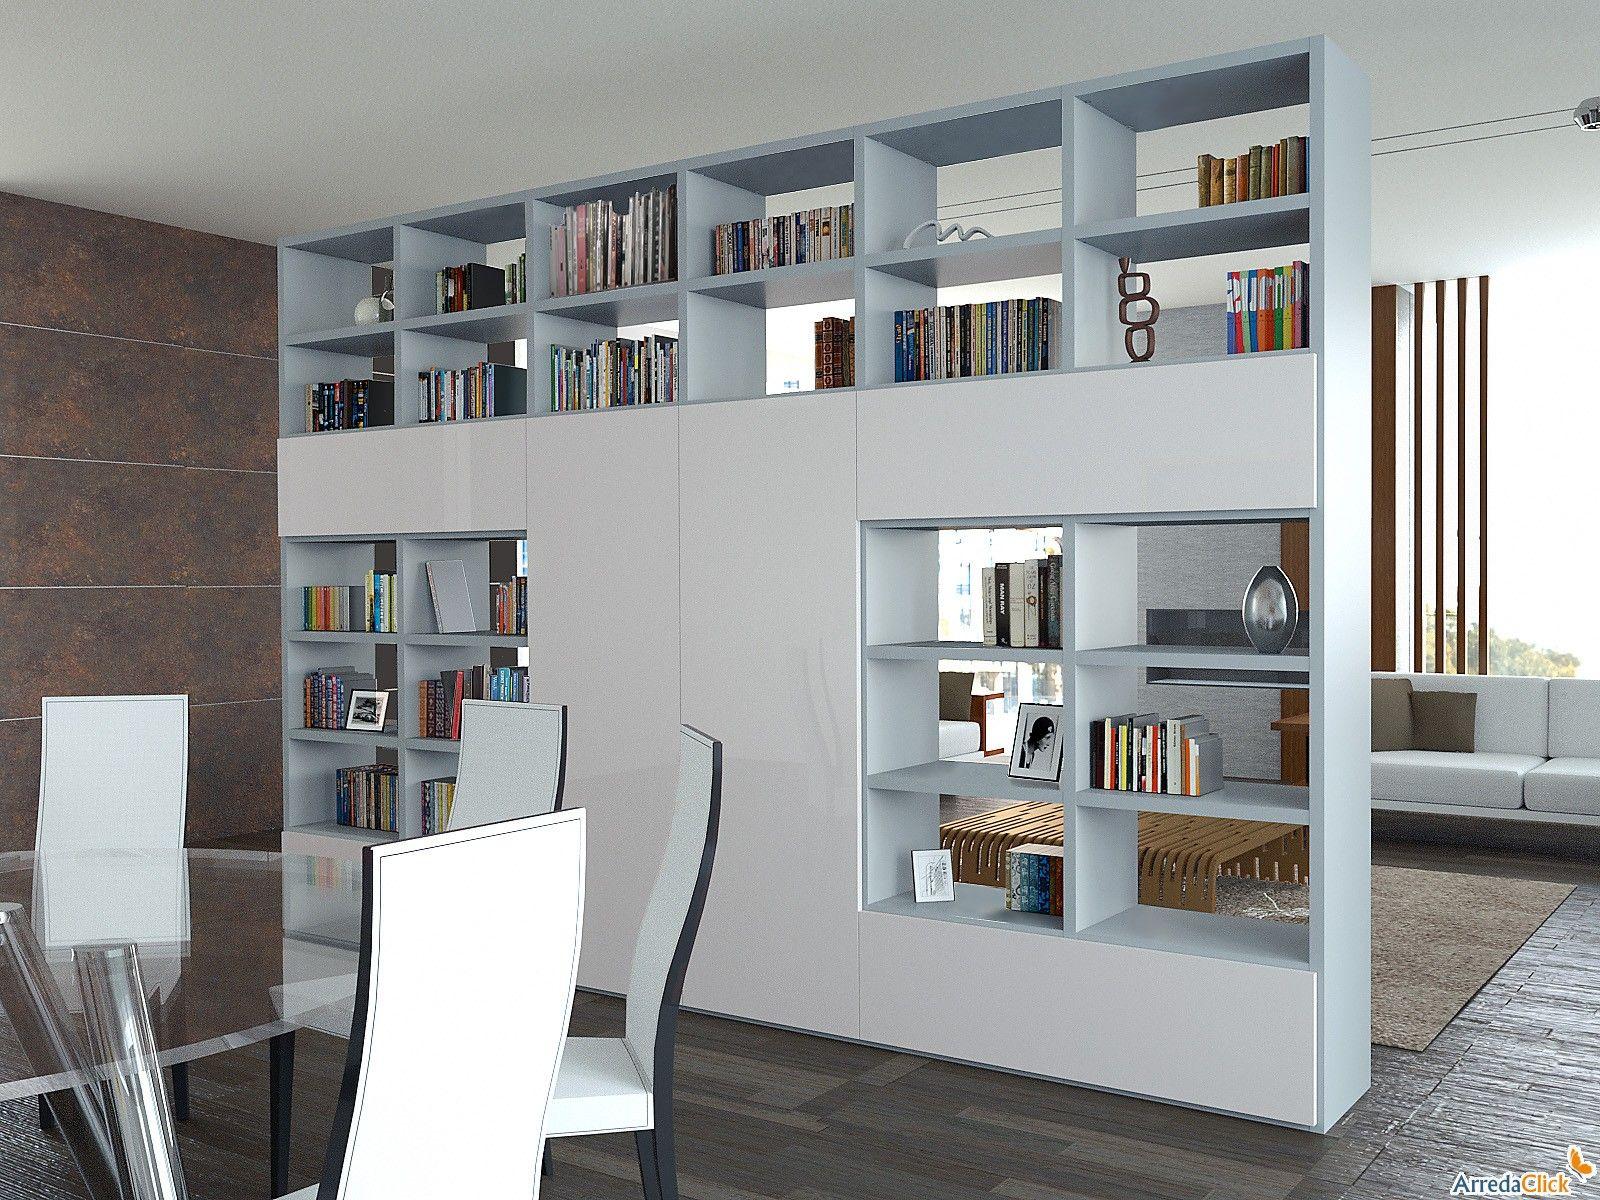 Objetos Decorativos Con Dise O Sofisticado Buscar Con Google  # Muebles Separadores Para Monoambientes